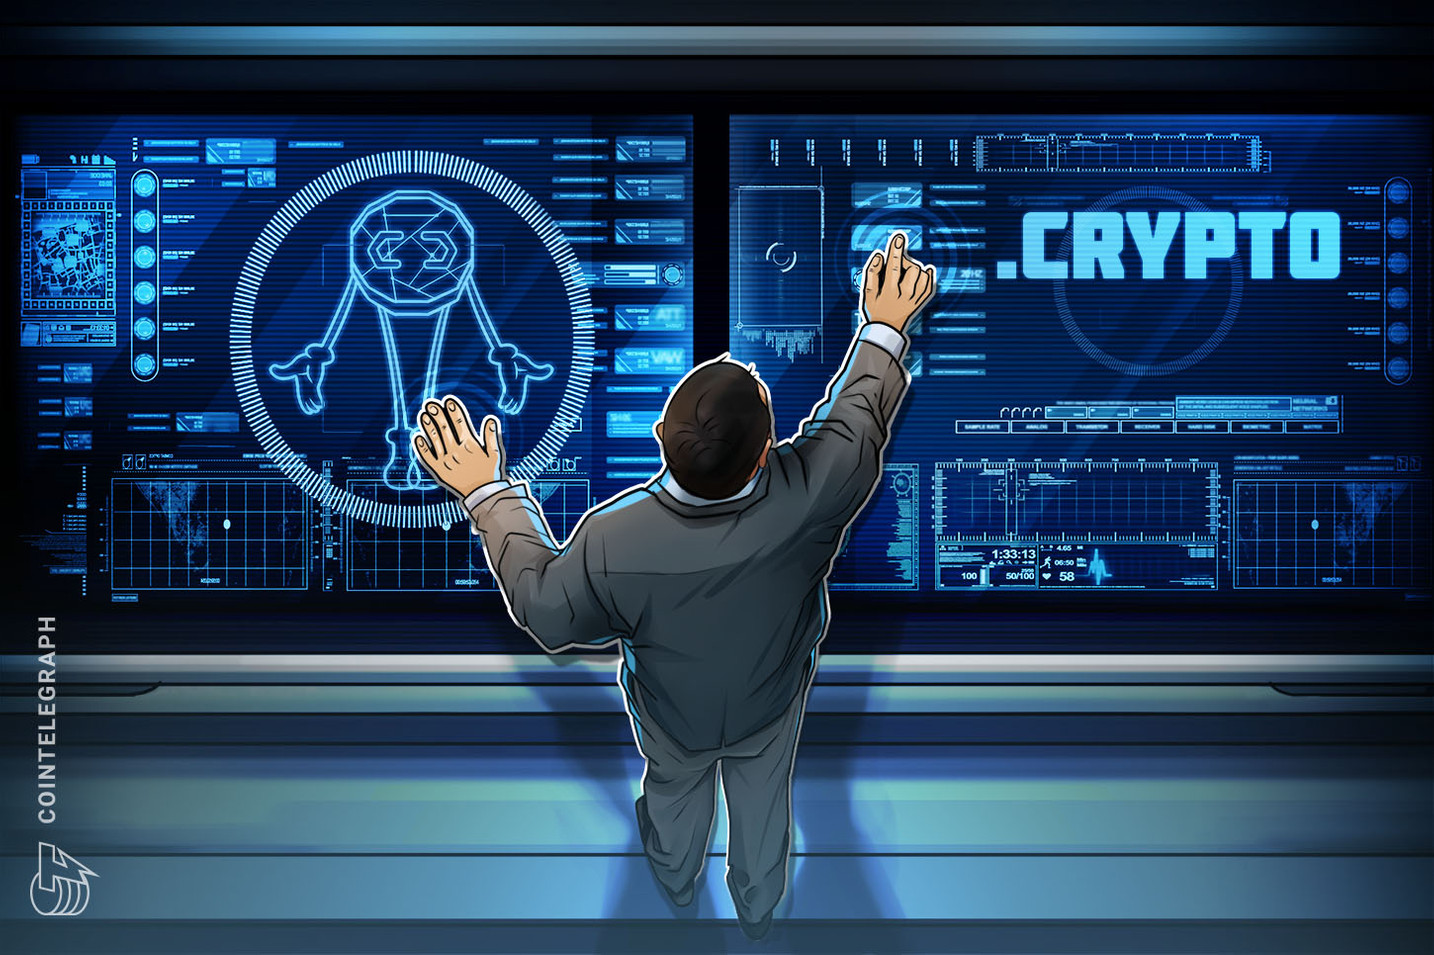 Gemini de Winklevoss ofrecerá la custodia de dominios blockchain .crypto